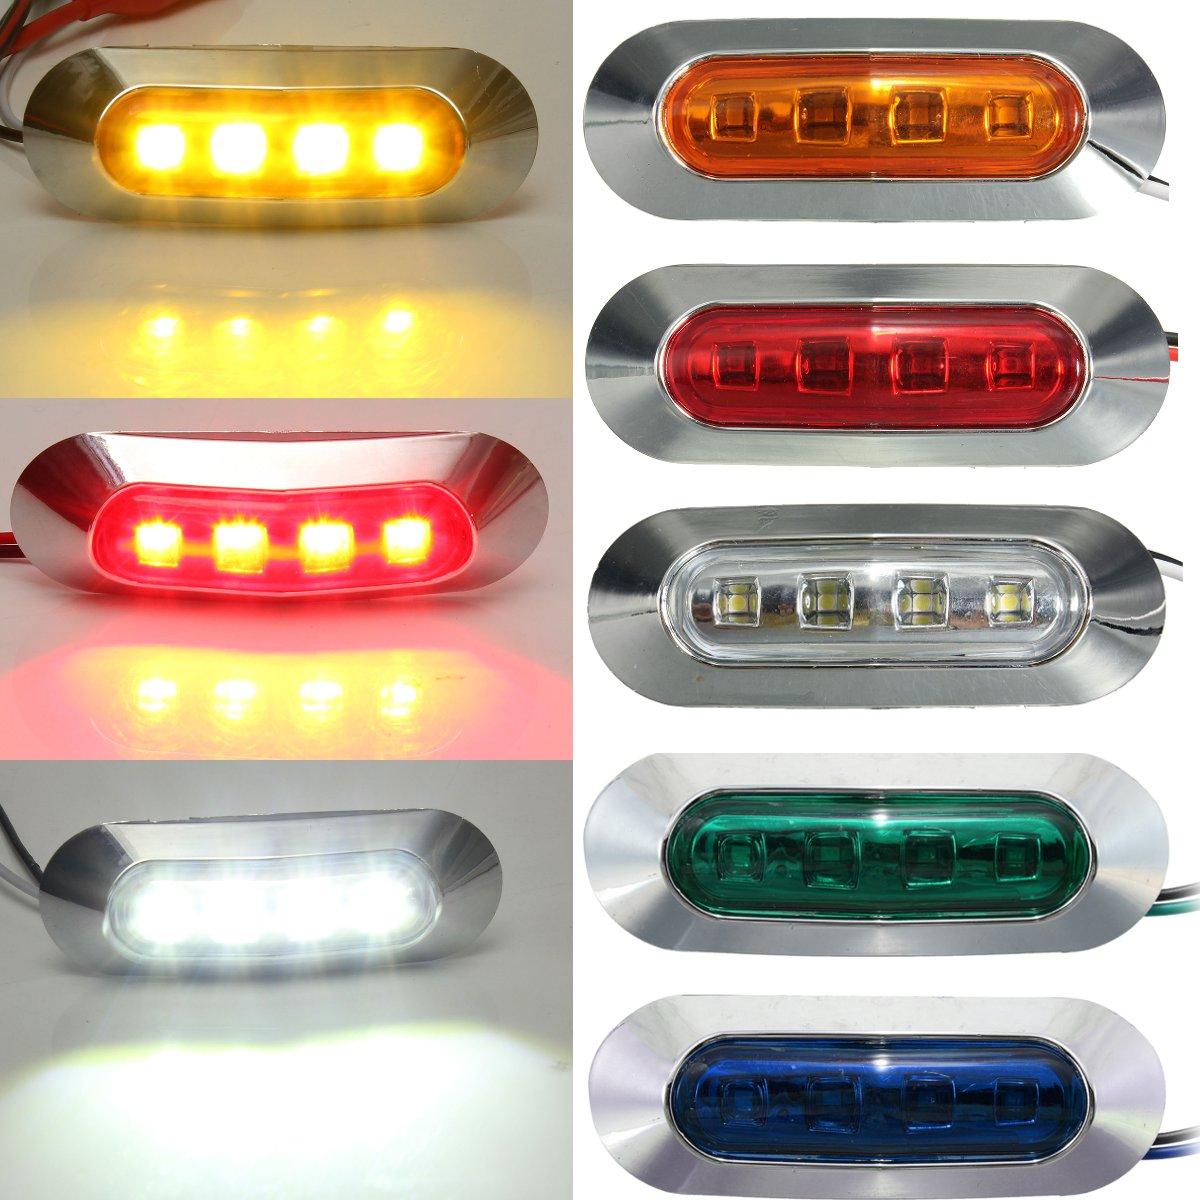 Luz de posición Universal 4led, luz indicadora lateral de distancia de posición de coche, camión, autobús, remolque, indicador lateral de luz roja, blanca, ámbar, azul y verde